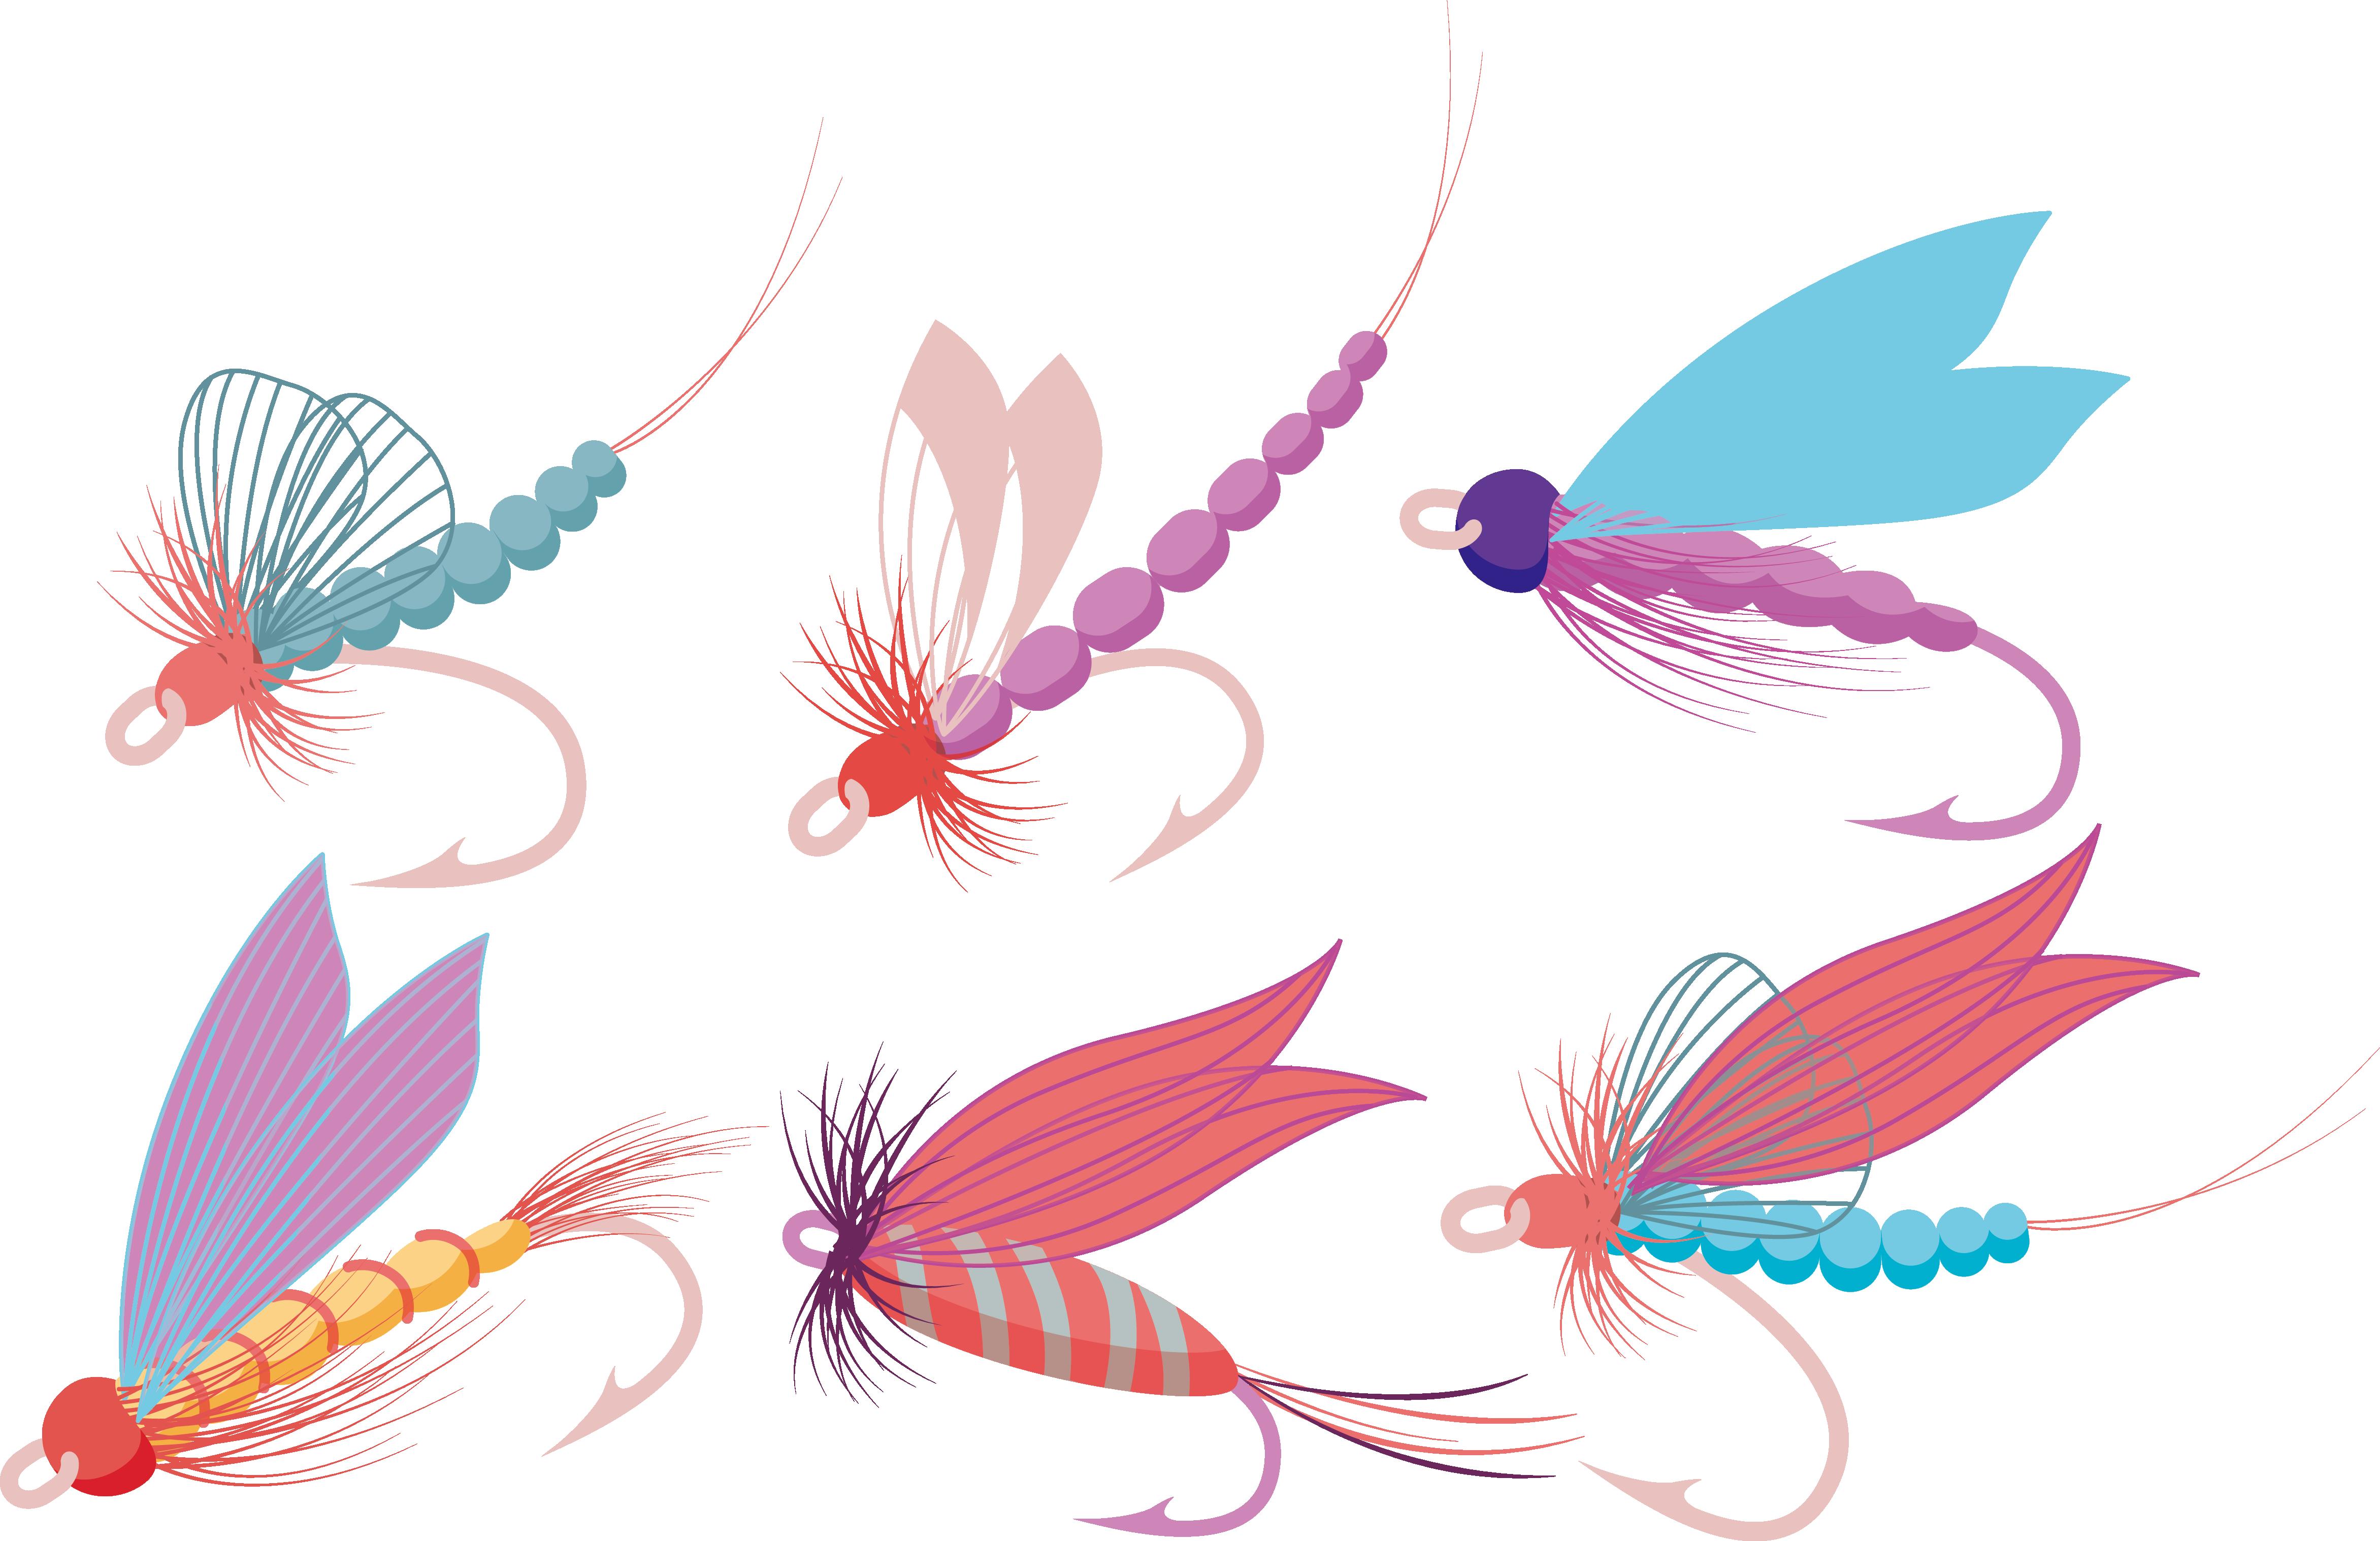 Fly fish hook clipart svg download Fly fishing Fish hook - Cartoon fresh fish hook 4687*3035 transprent ... svg download